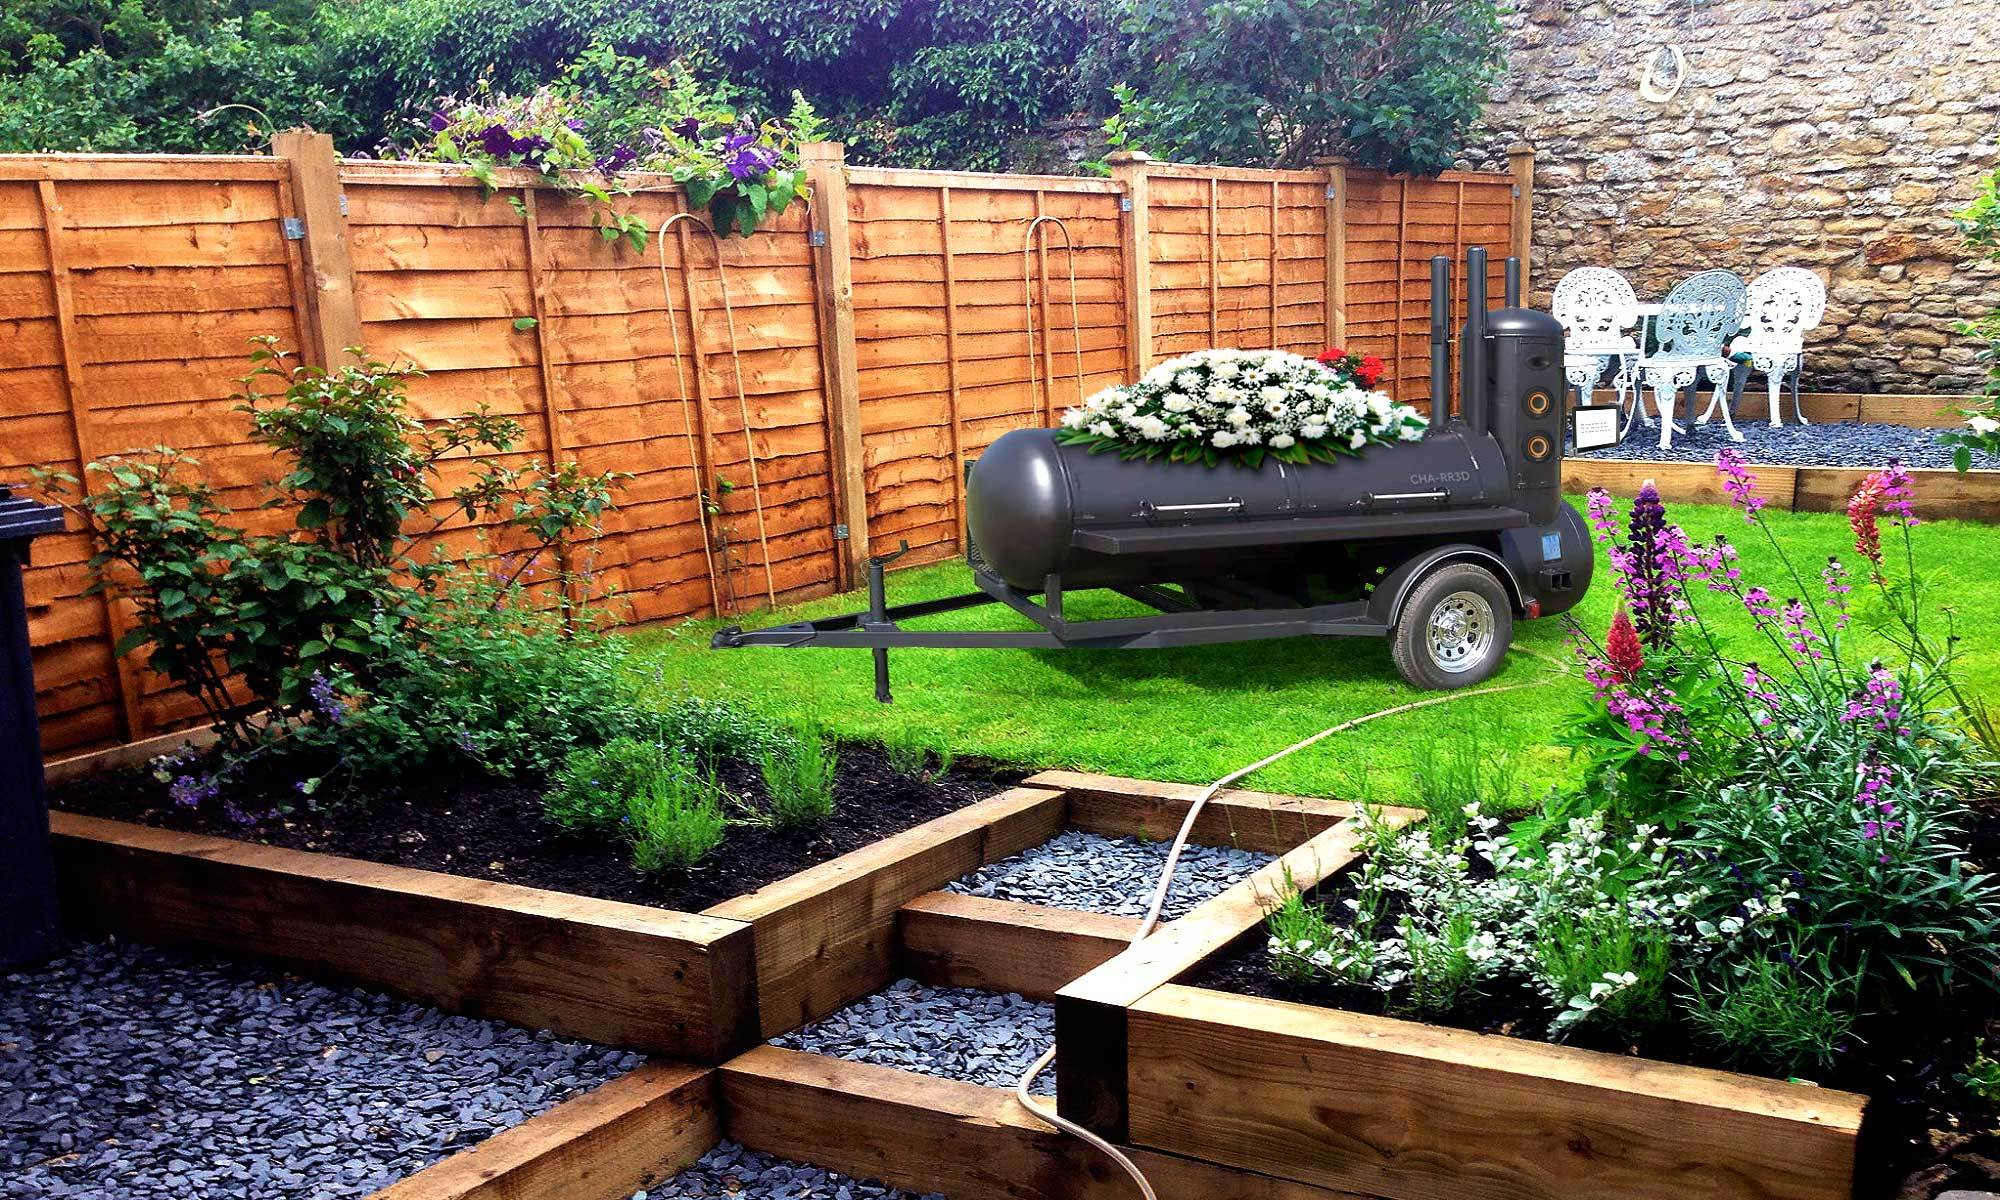 Cremation equipment in a house garden